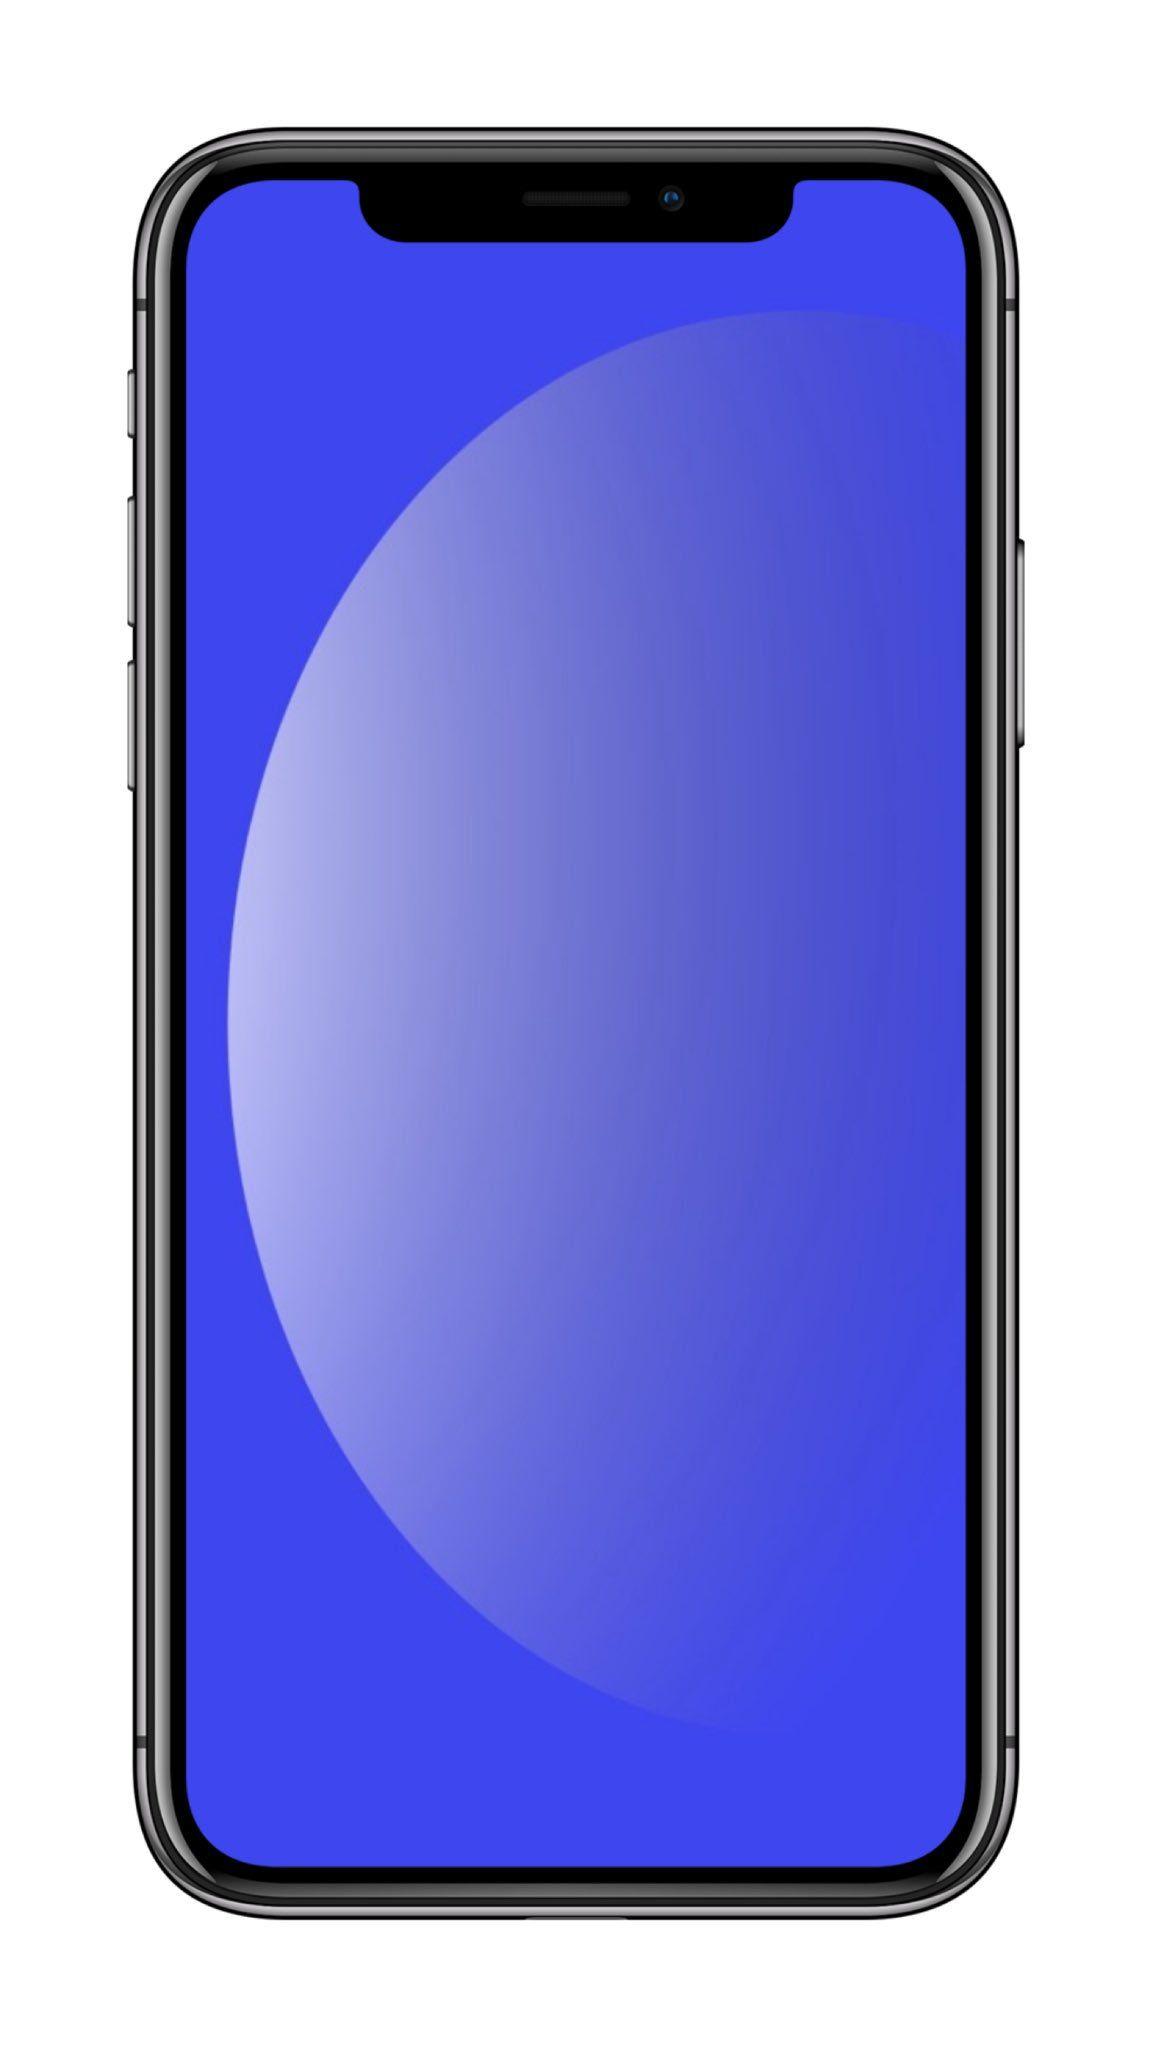 Hotspot4u on samsung galaxy accessories app design